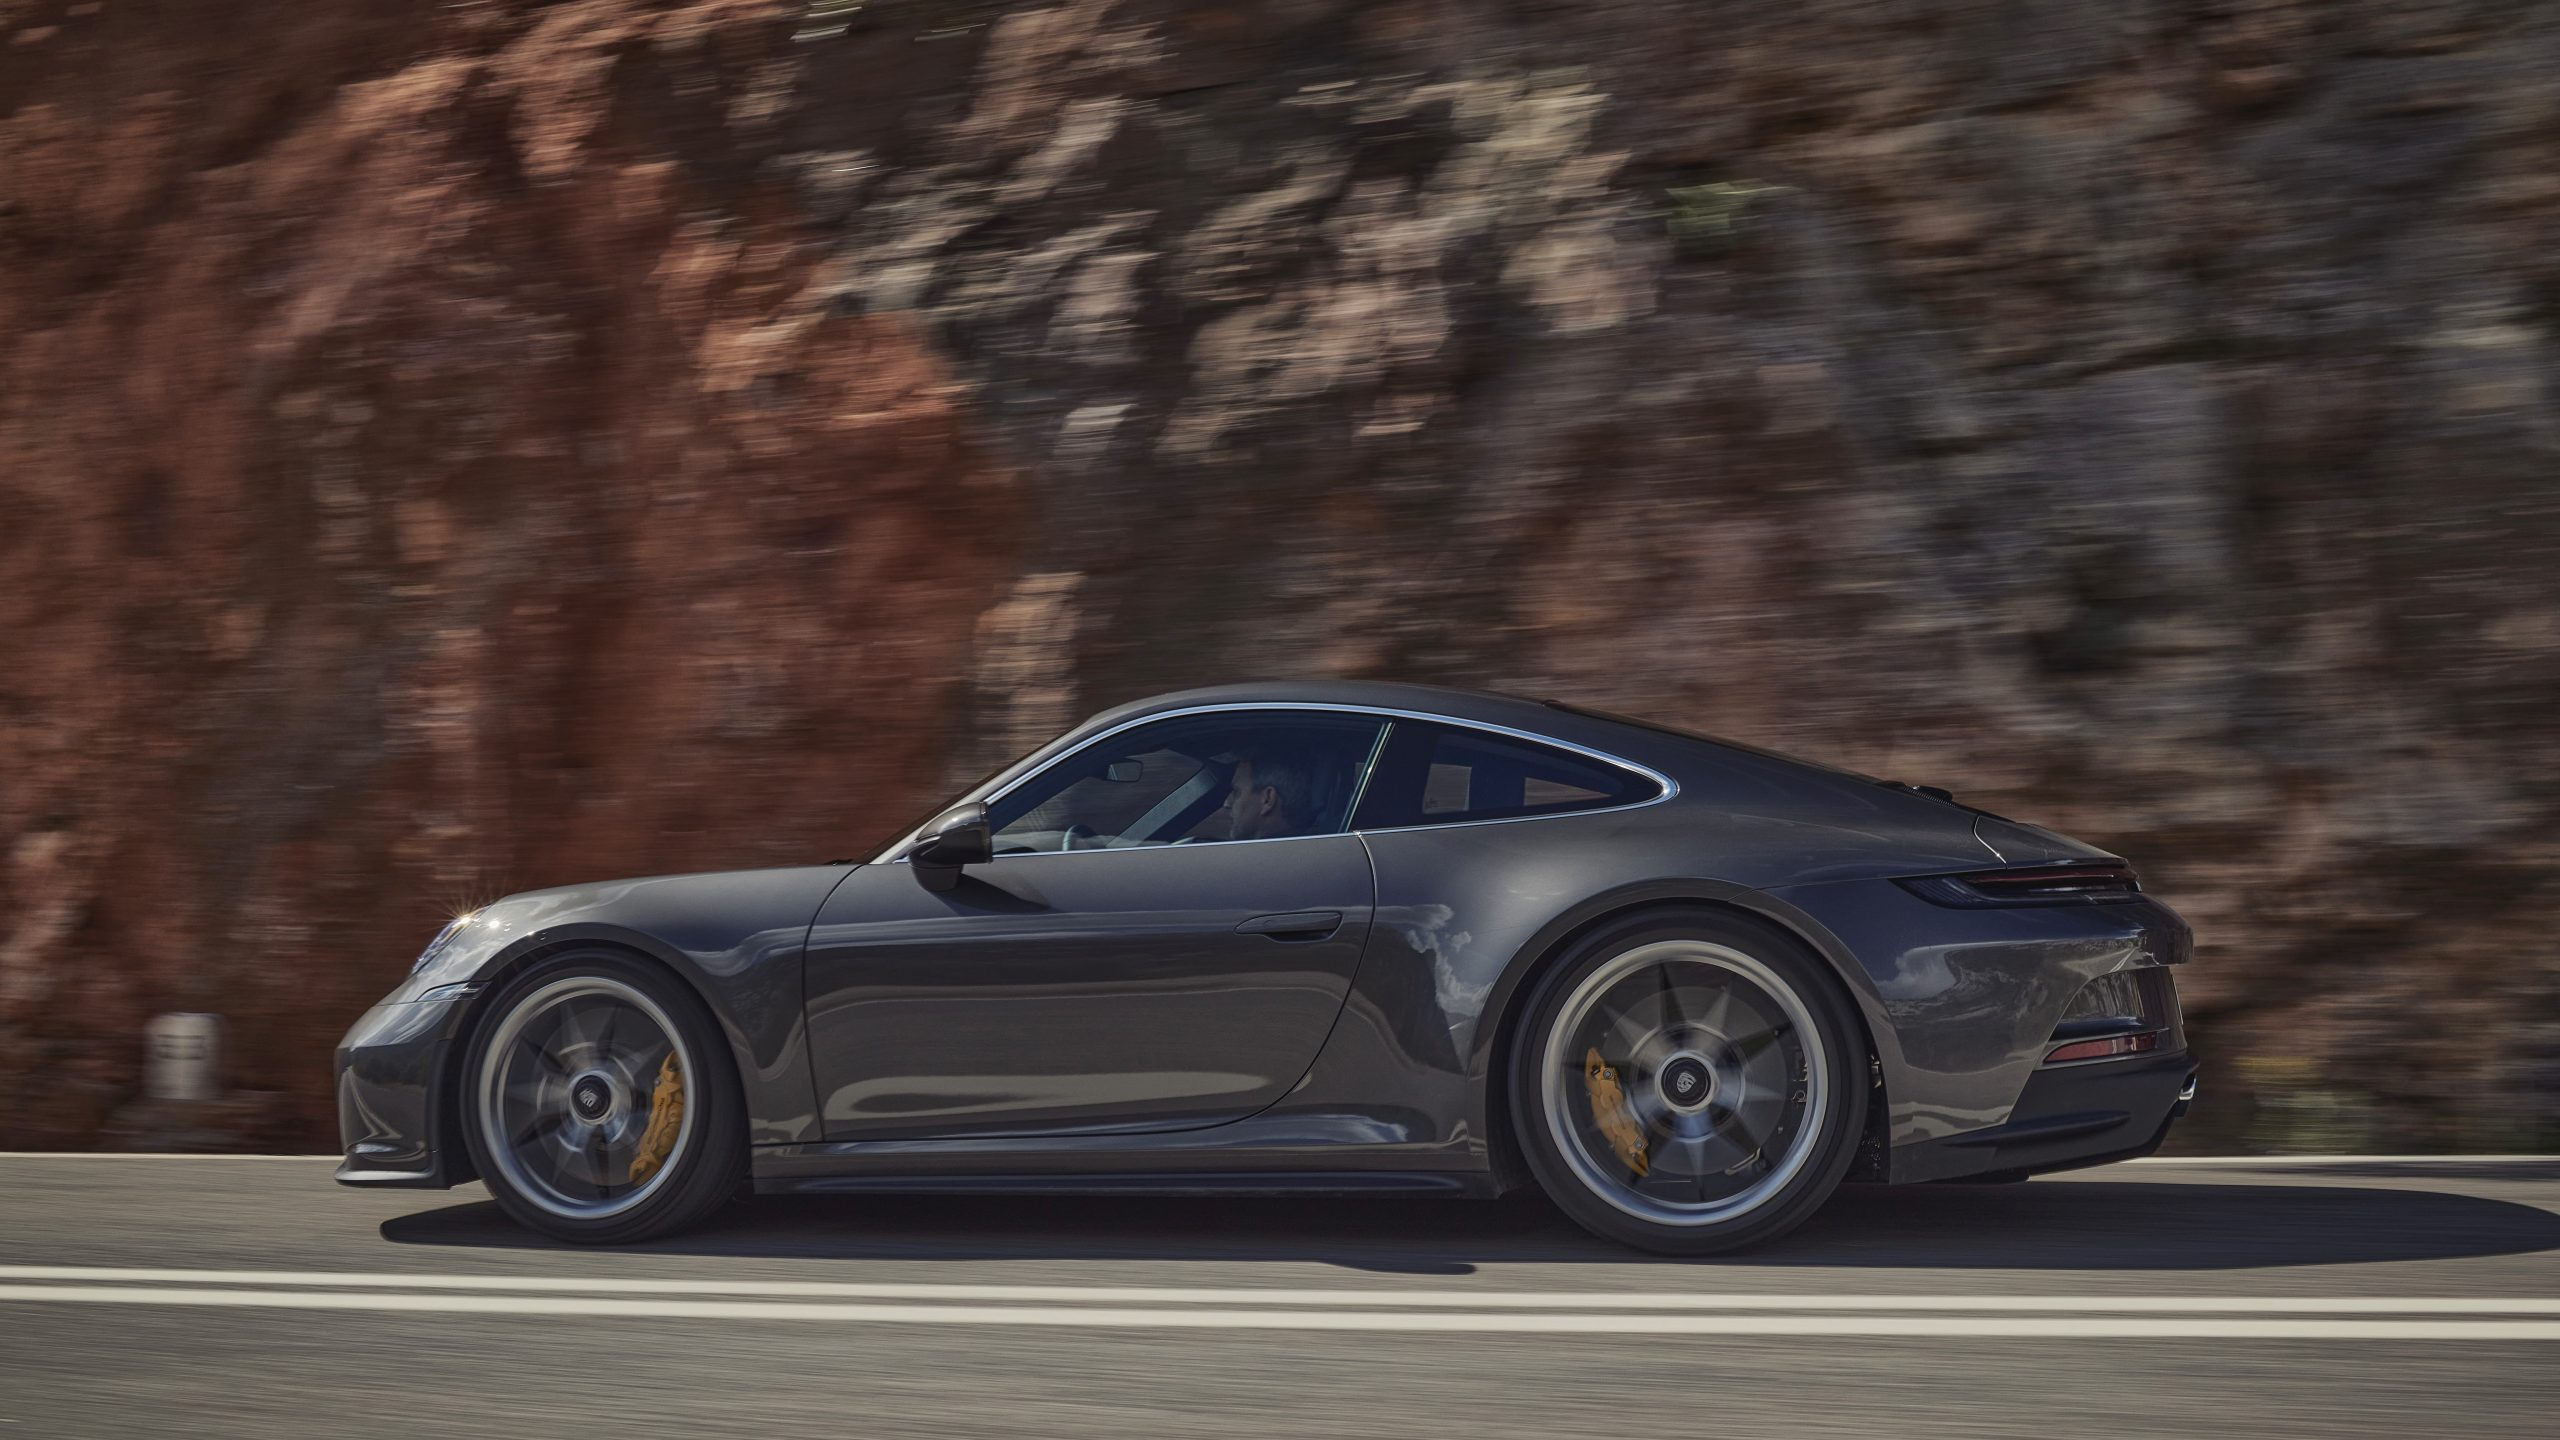 img 19 scaled Τι δίνει στην Porsche 992 GT3 Touring, τη δική της μοναδική γοητεία 911, 992, Porsche, Porsche 911, Porsche 911 GT3, sportscar, zblog, ειδήσεις, Νέα